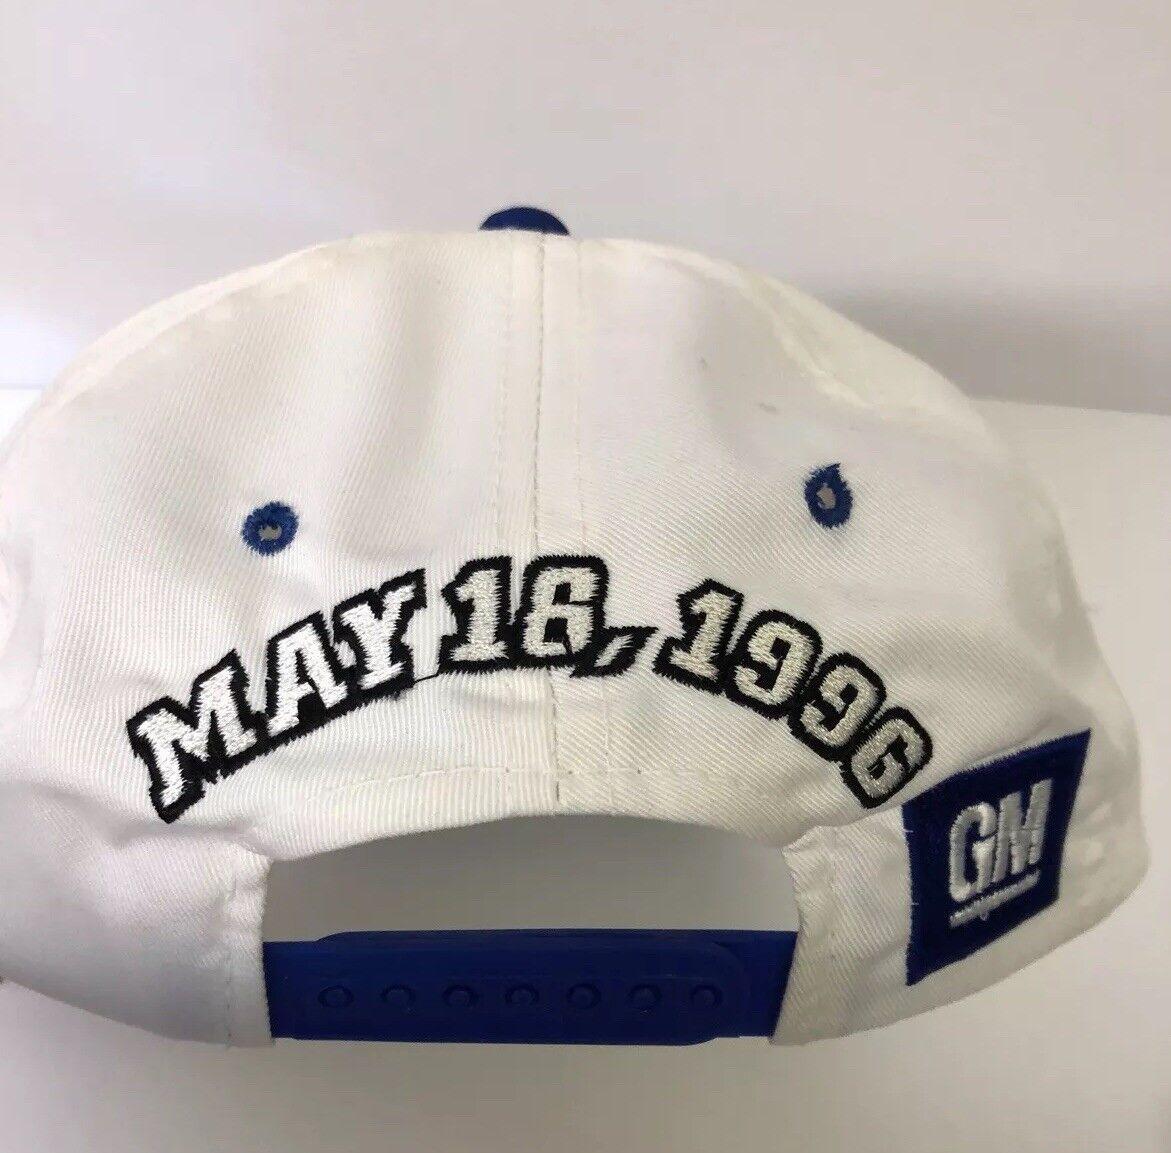 1996 Dale Earnhardt Big Car Red Blue White & Blue Red Nascar SnapBack Hat Cap a9e1c5